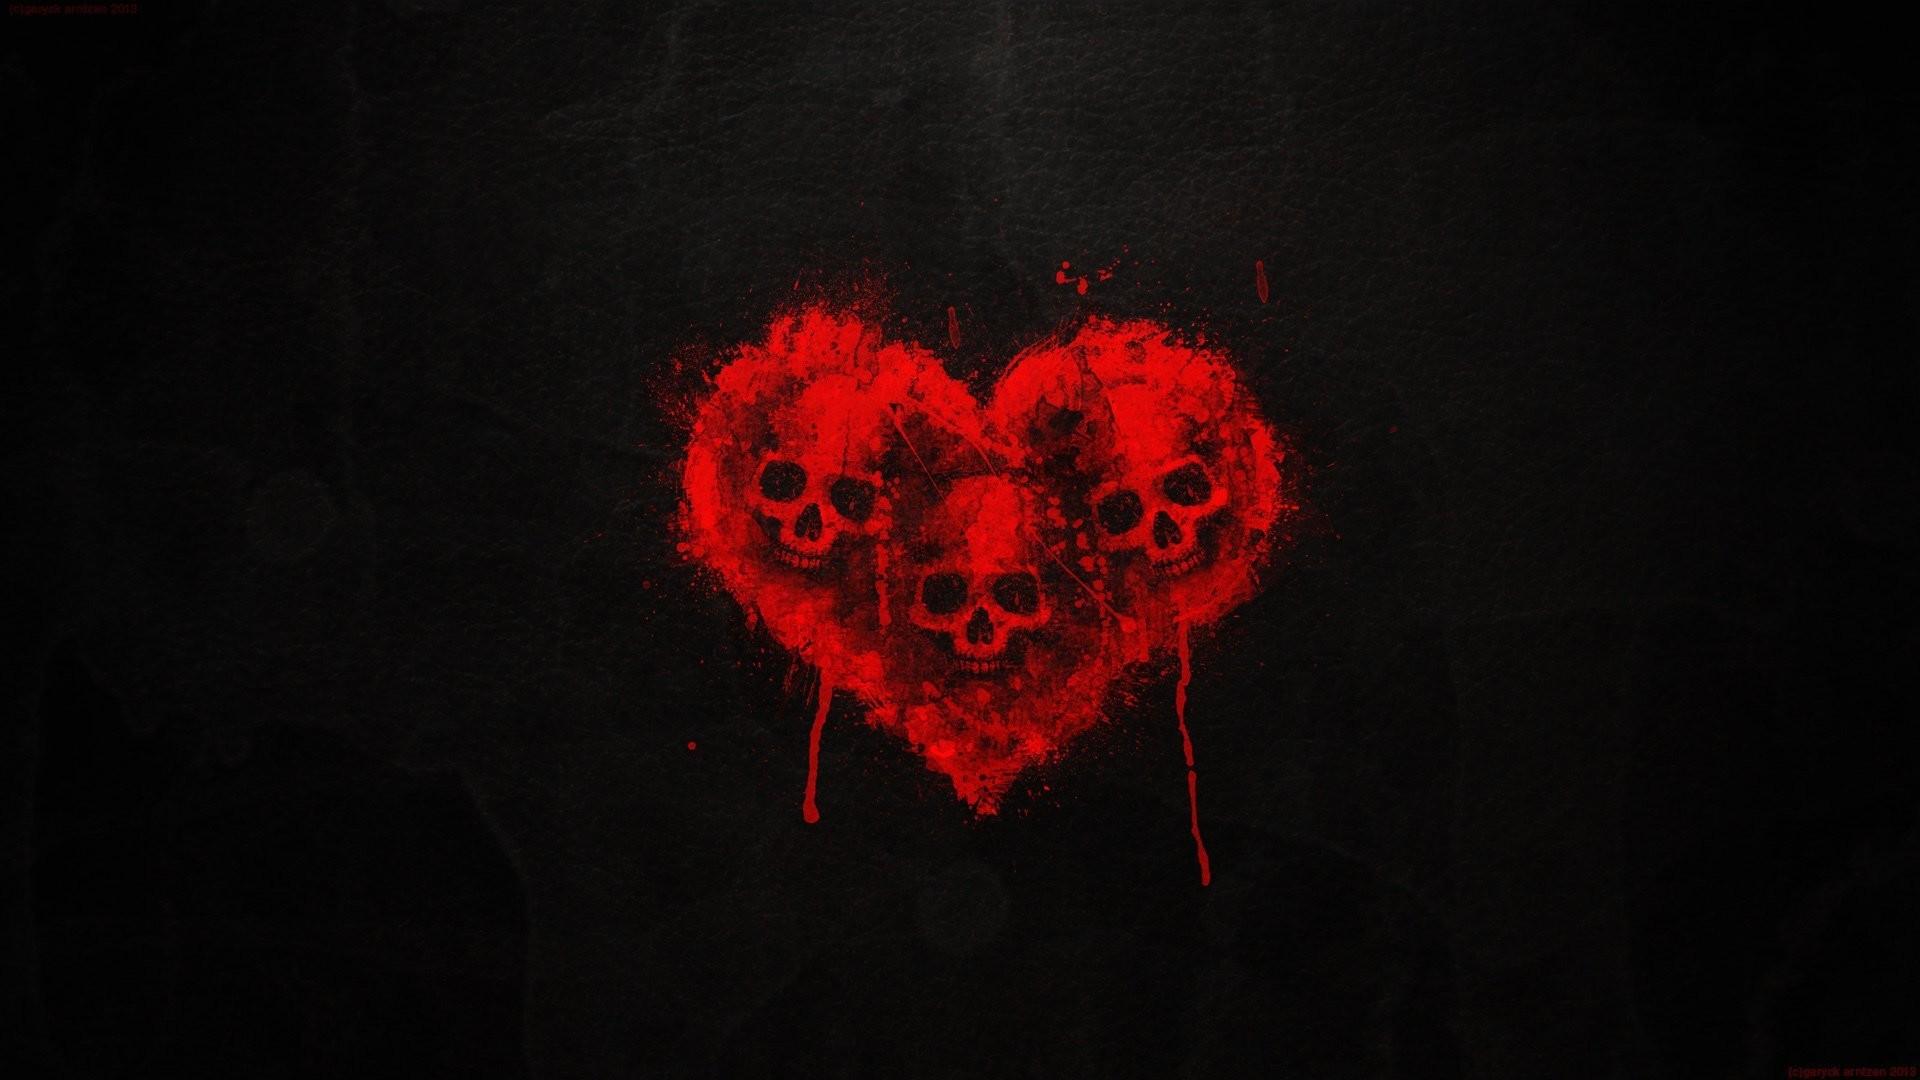 1920x1080 Wallpaper Patterns Lines Heart Black Background